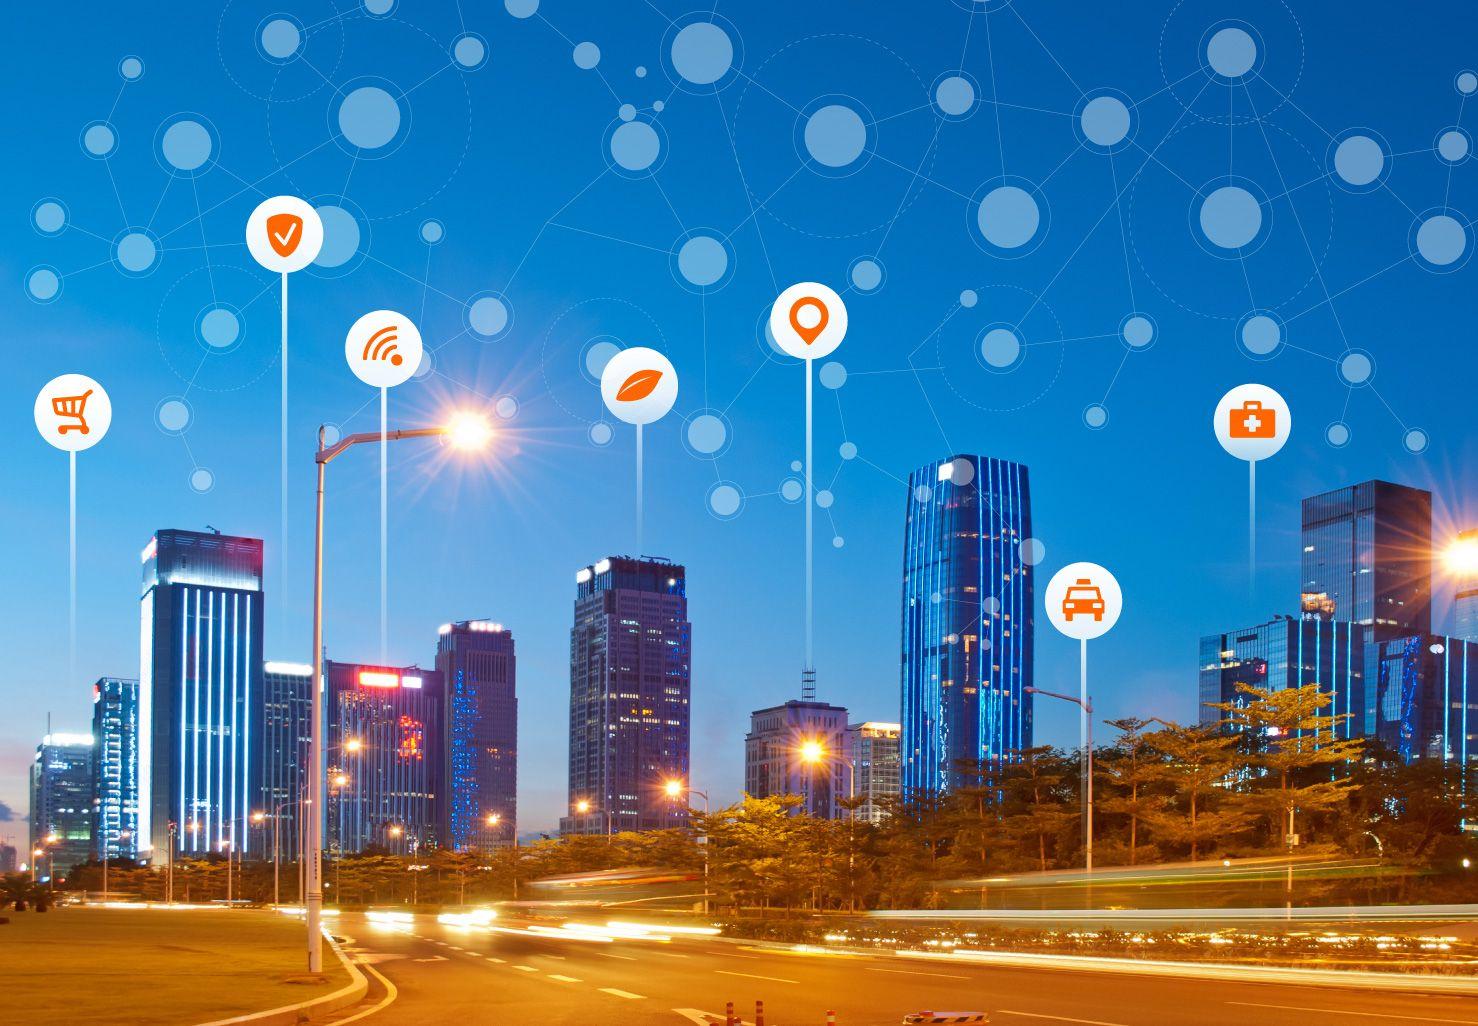 Texus Smart City